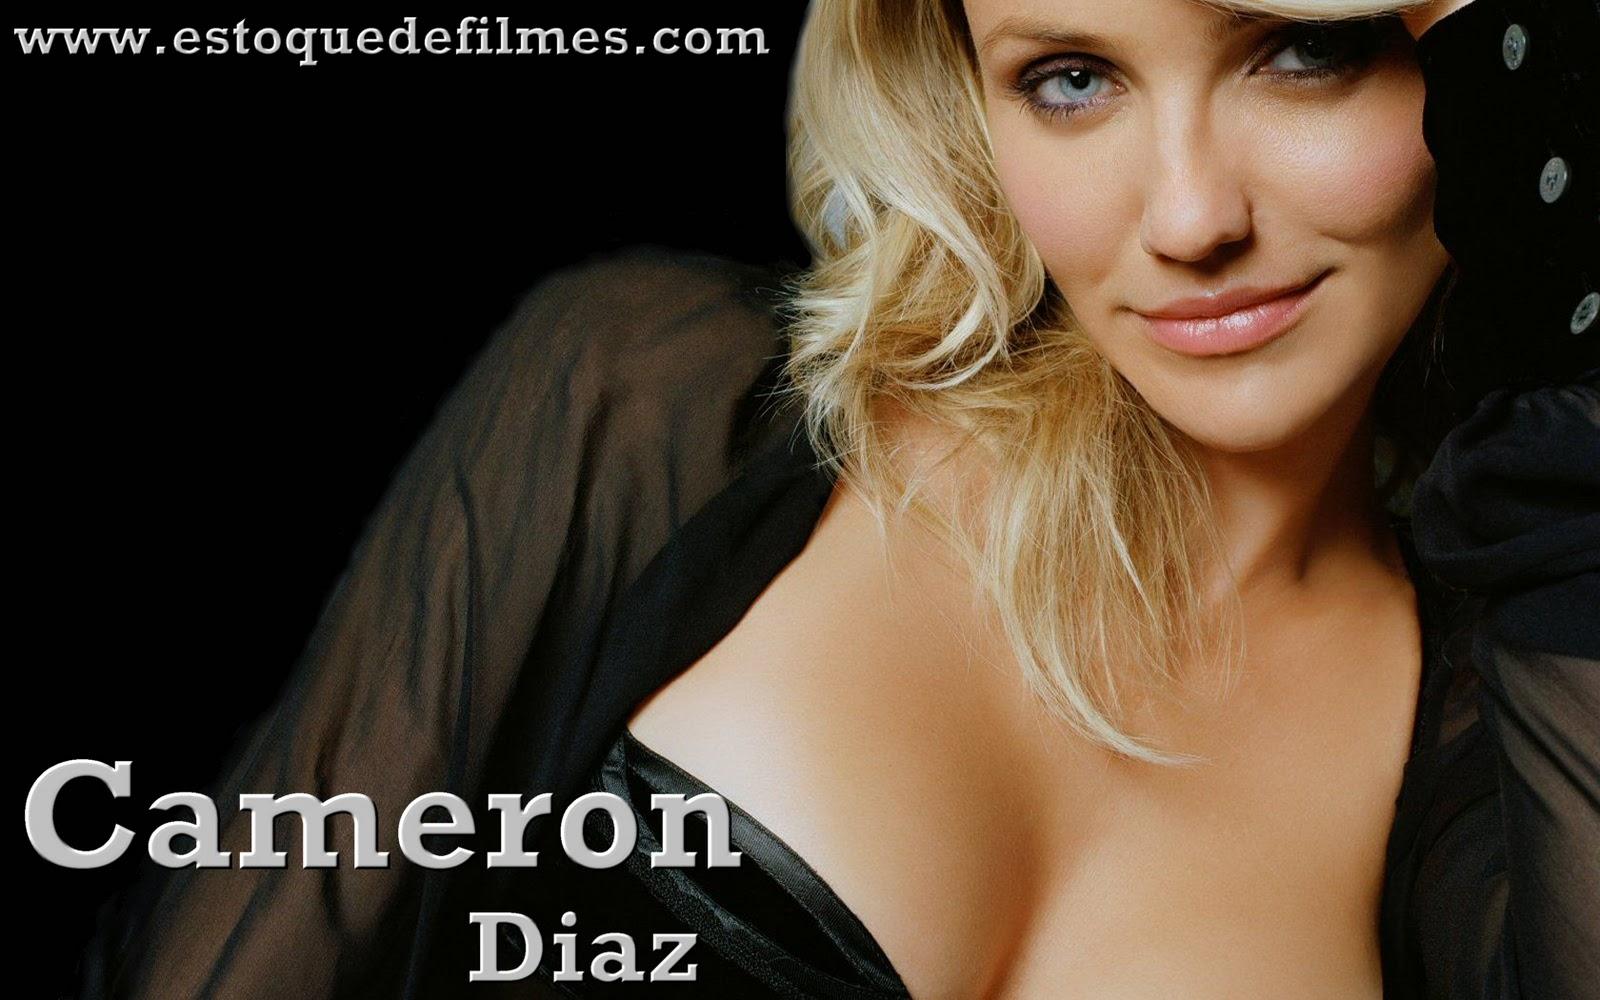 http://4.bp.blogspot.com/-INPFbGr57wU/TpuY6TuUV0I/AAAAAAAABvI/7aodMIVUUAU/s1600/Cameron+Diaz+3.jpg